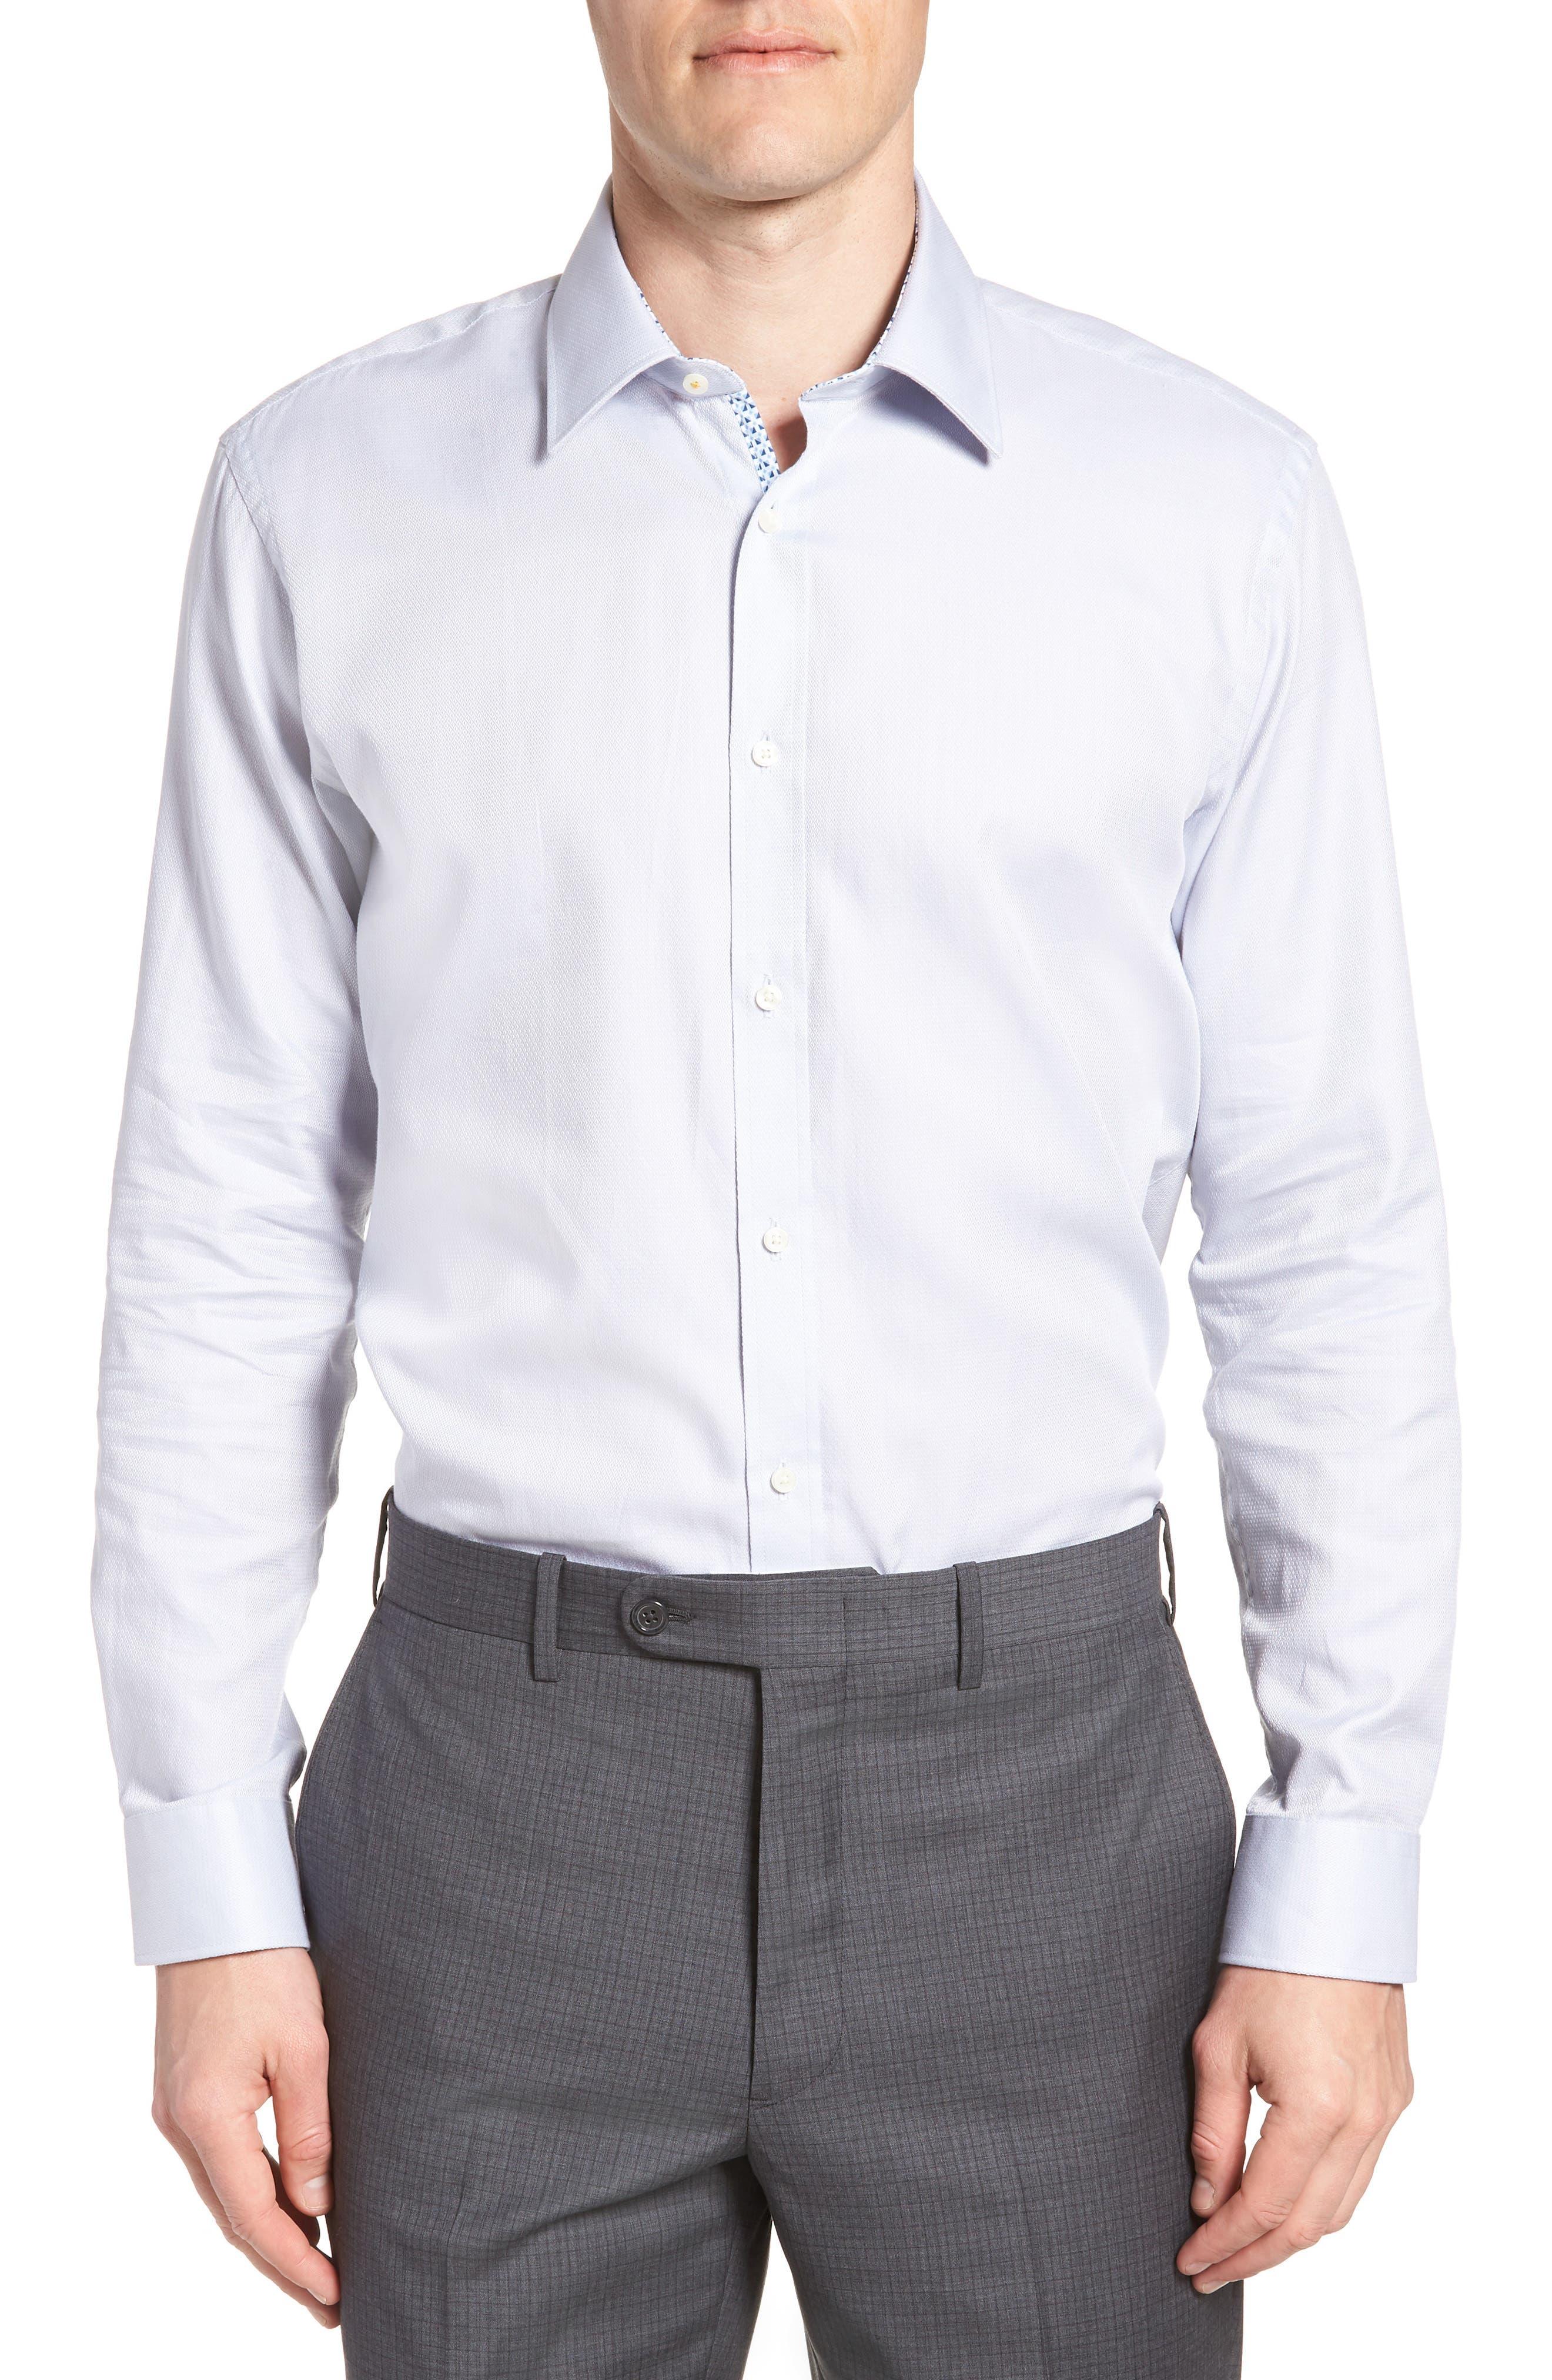 Ollyox Slim Fit Solid Dress Shirt,                             Main thumbnail 1, color,                             GREY